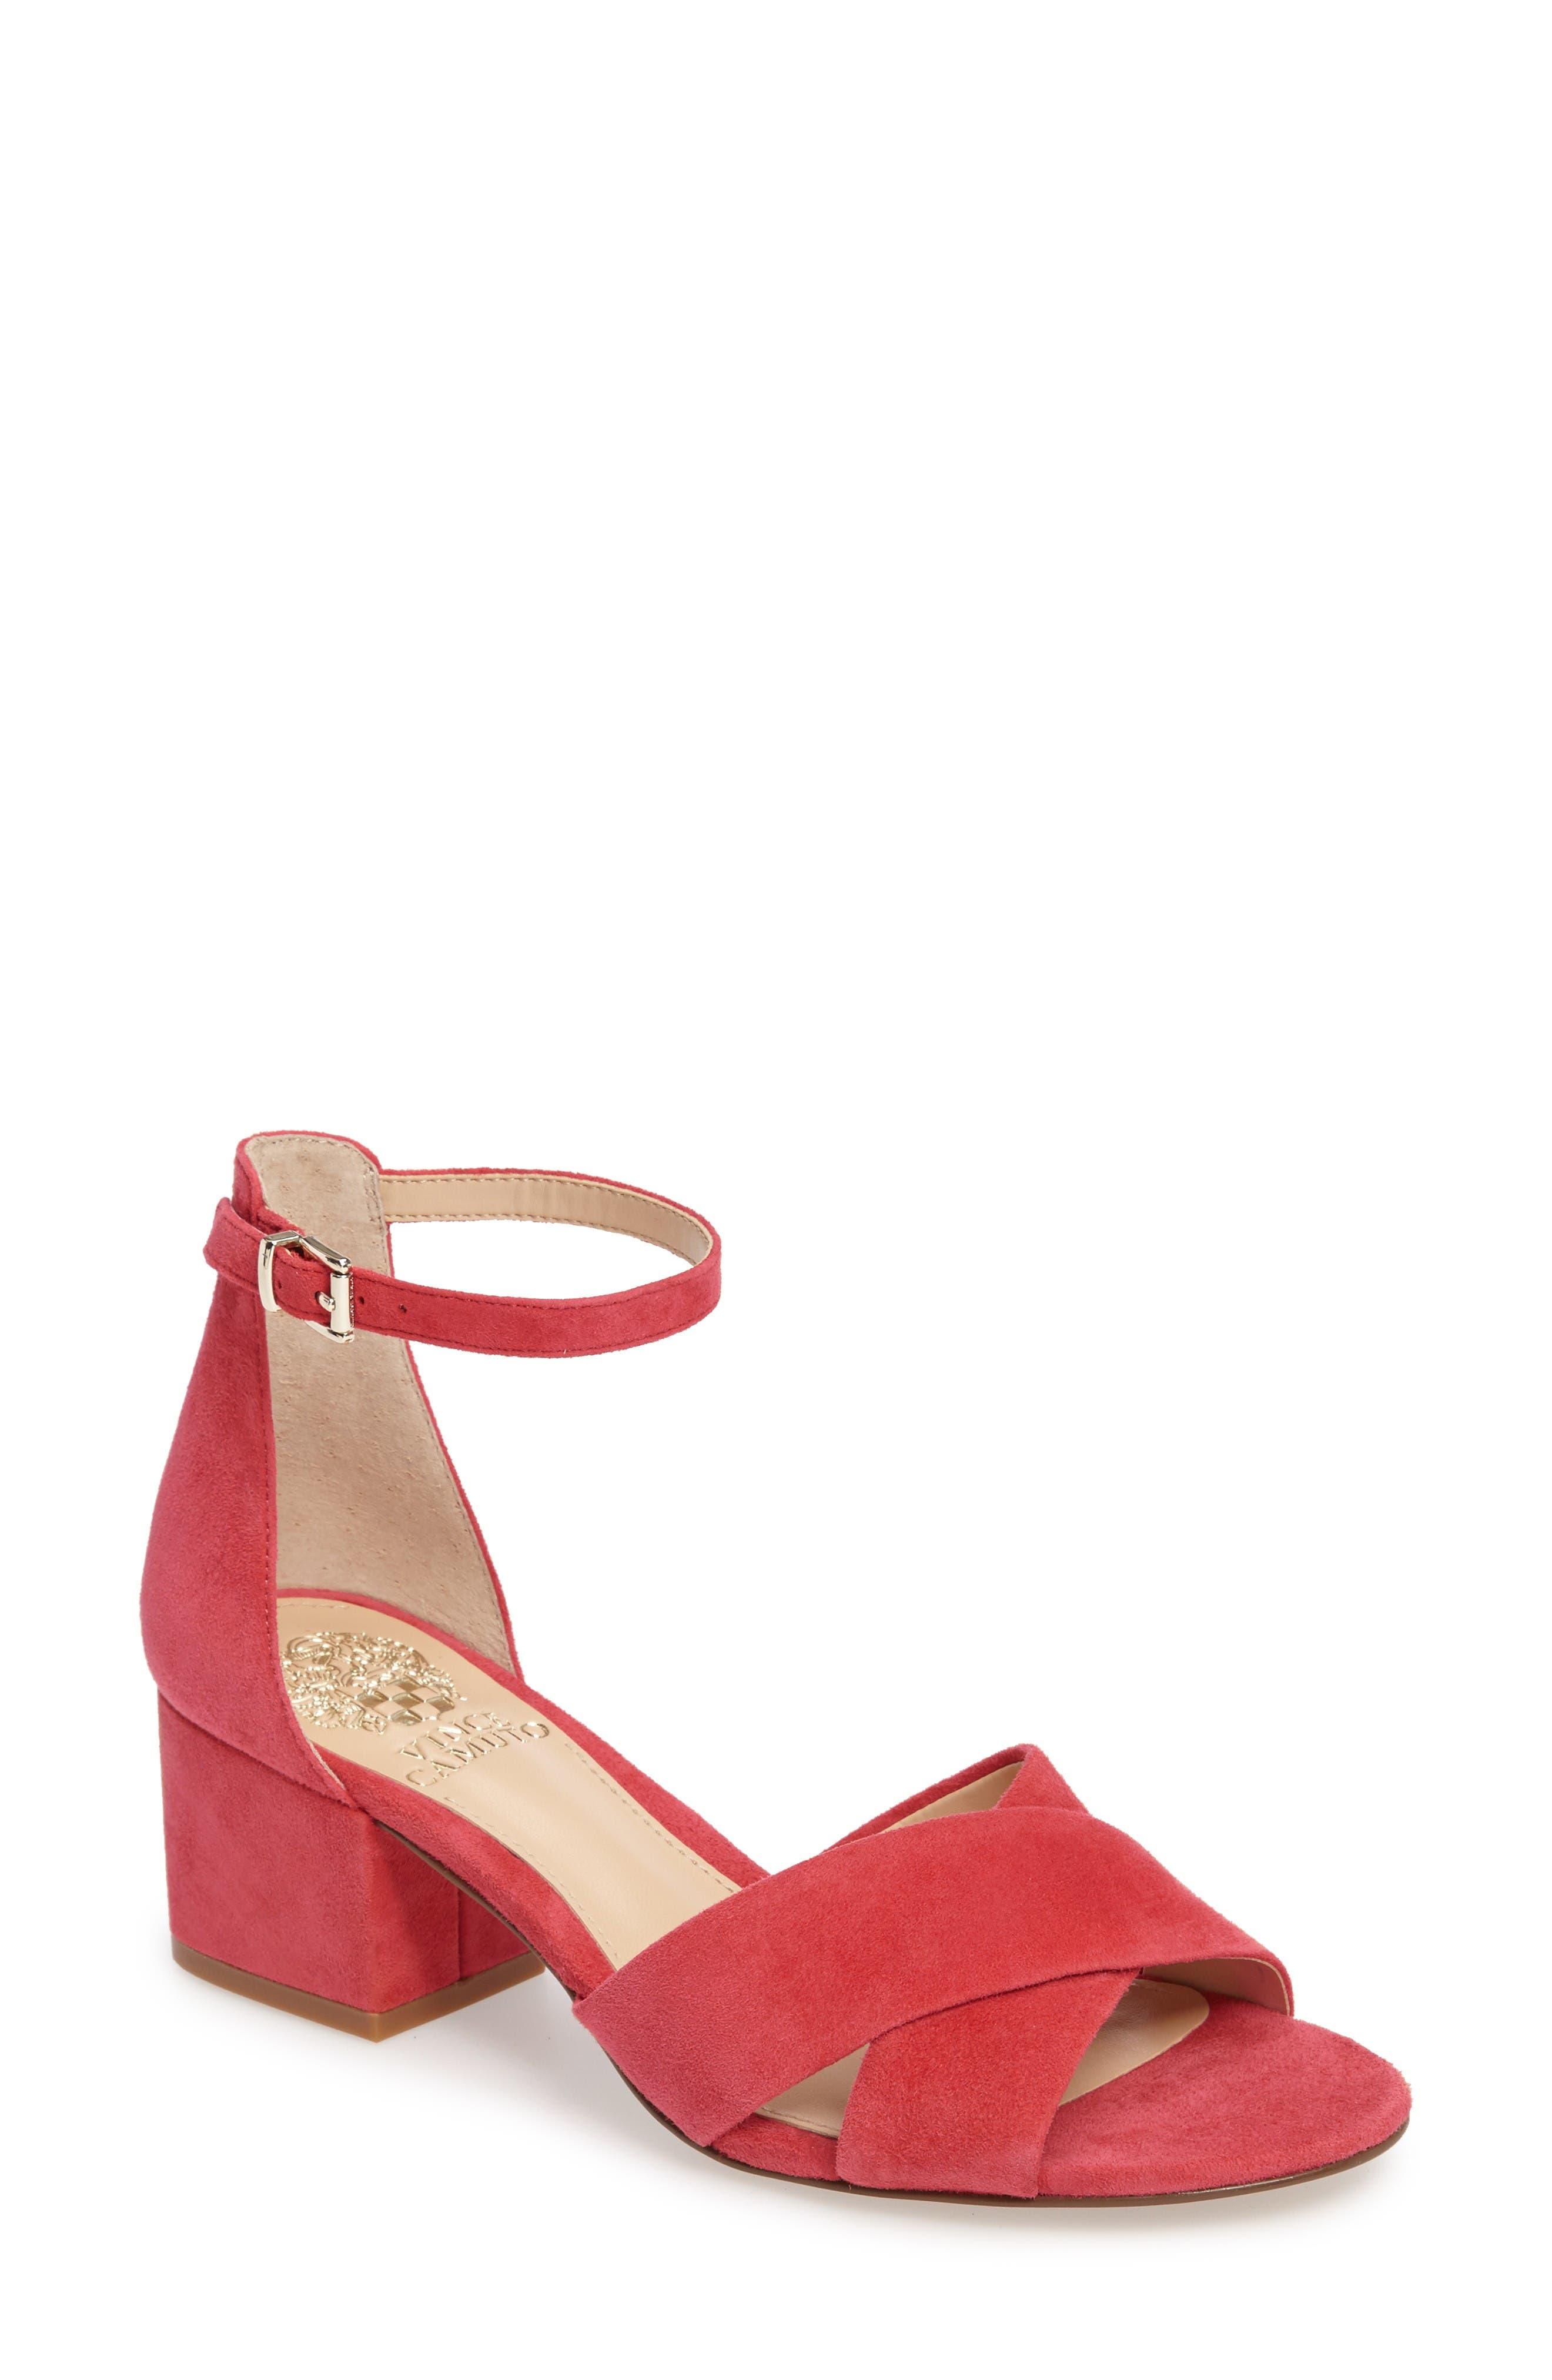 Vince Camuto Florrie Ankle Strap Sandal (Women)